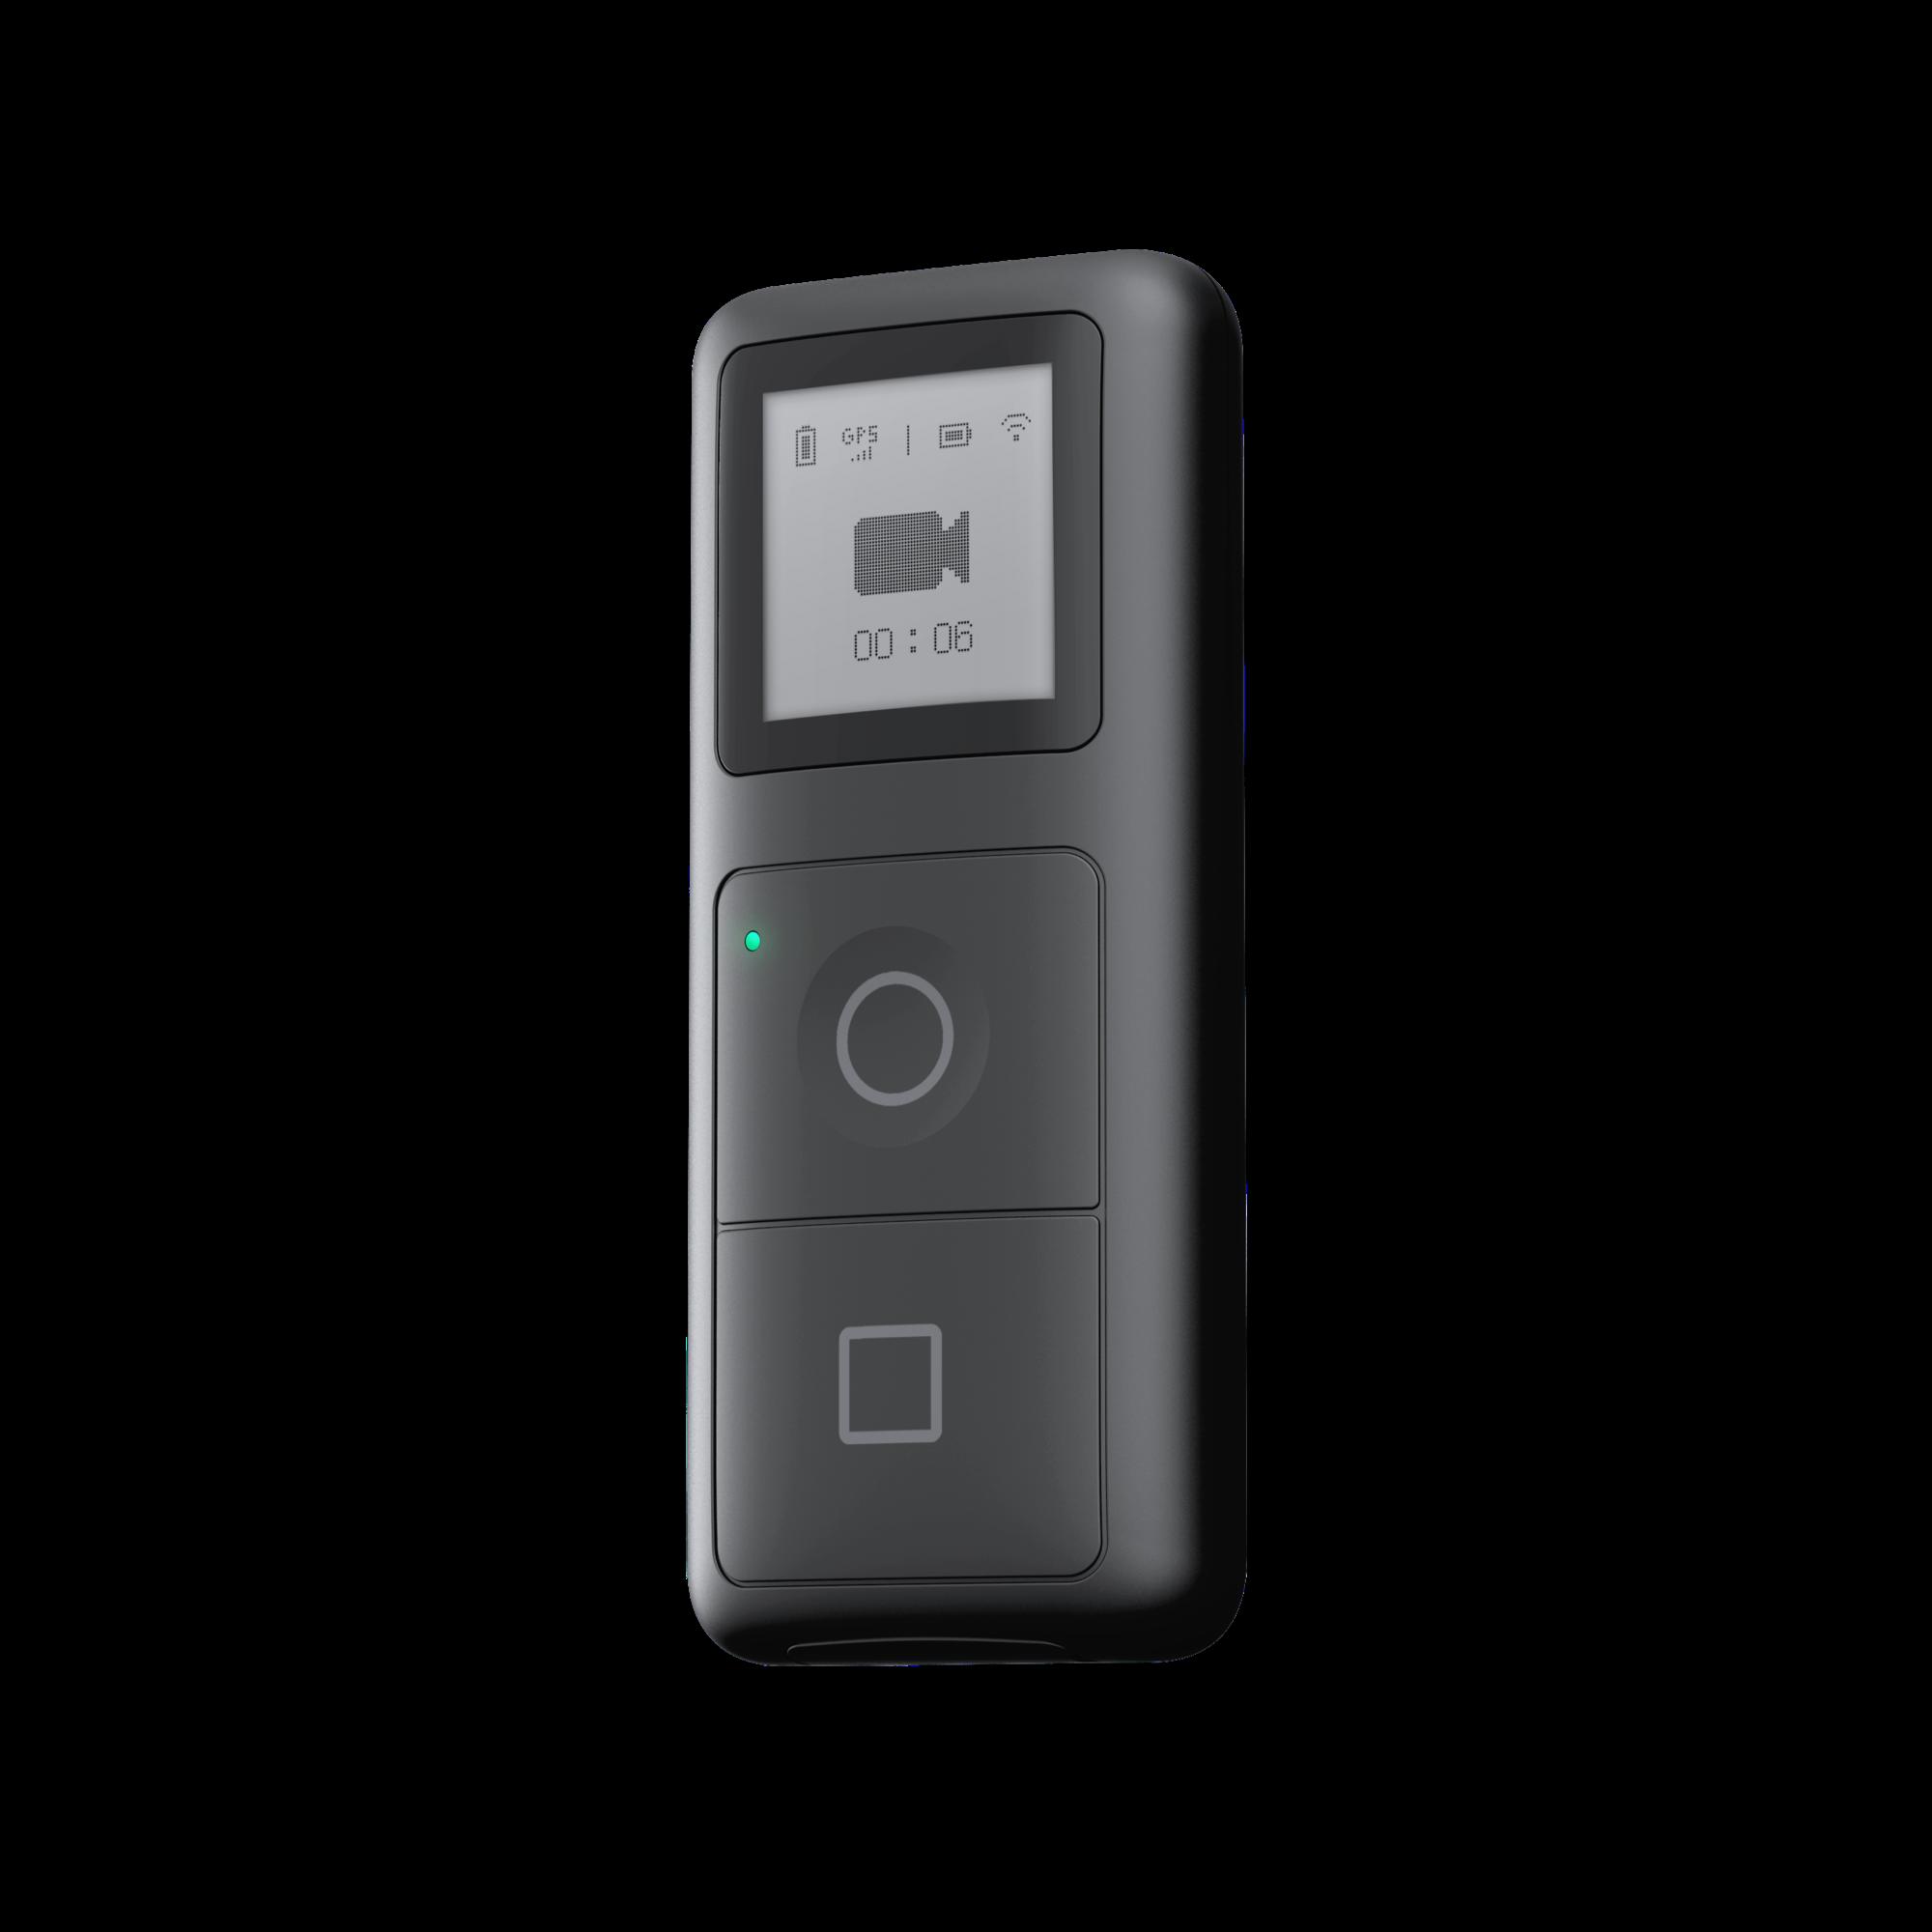 GPS Smart Remote - PerspectiveView - Transparent